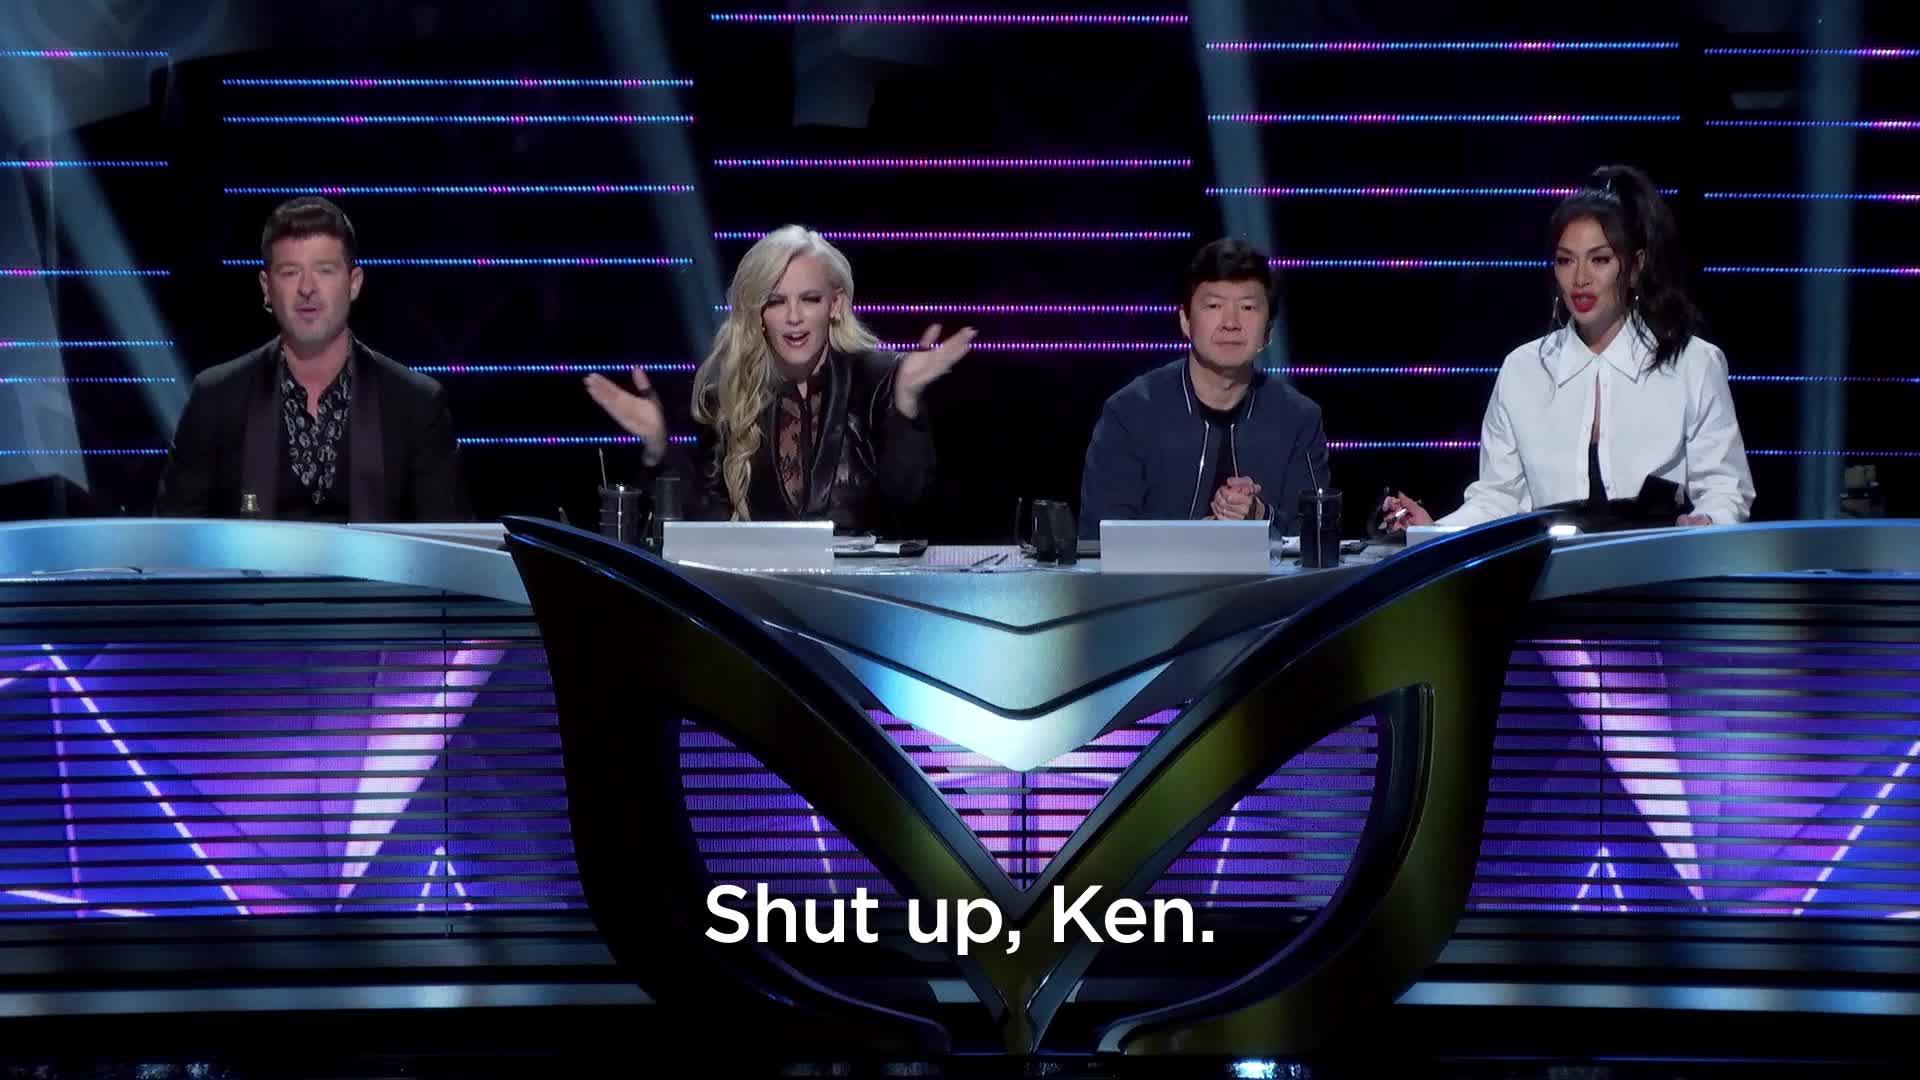 applause, jenny mccarthy, ken jeong, masked singer, nicole scherzinger, oh snap, robin thicke, shut up, slow clap, the masked singer, the masked singer on fox, Shut Up, Ken GIFs